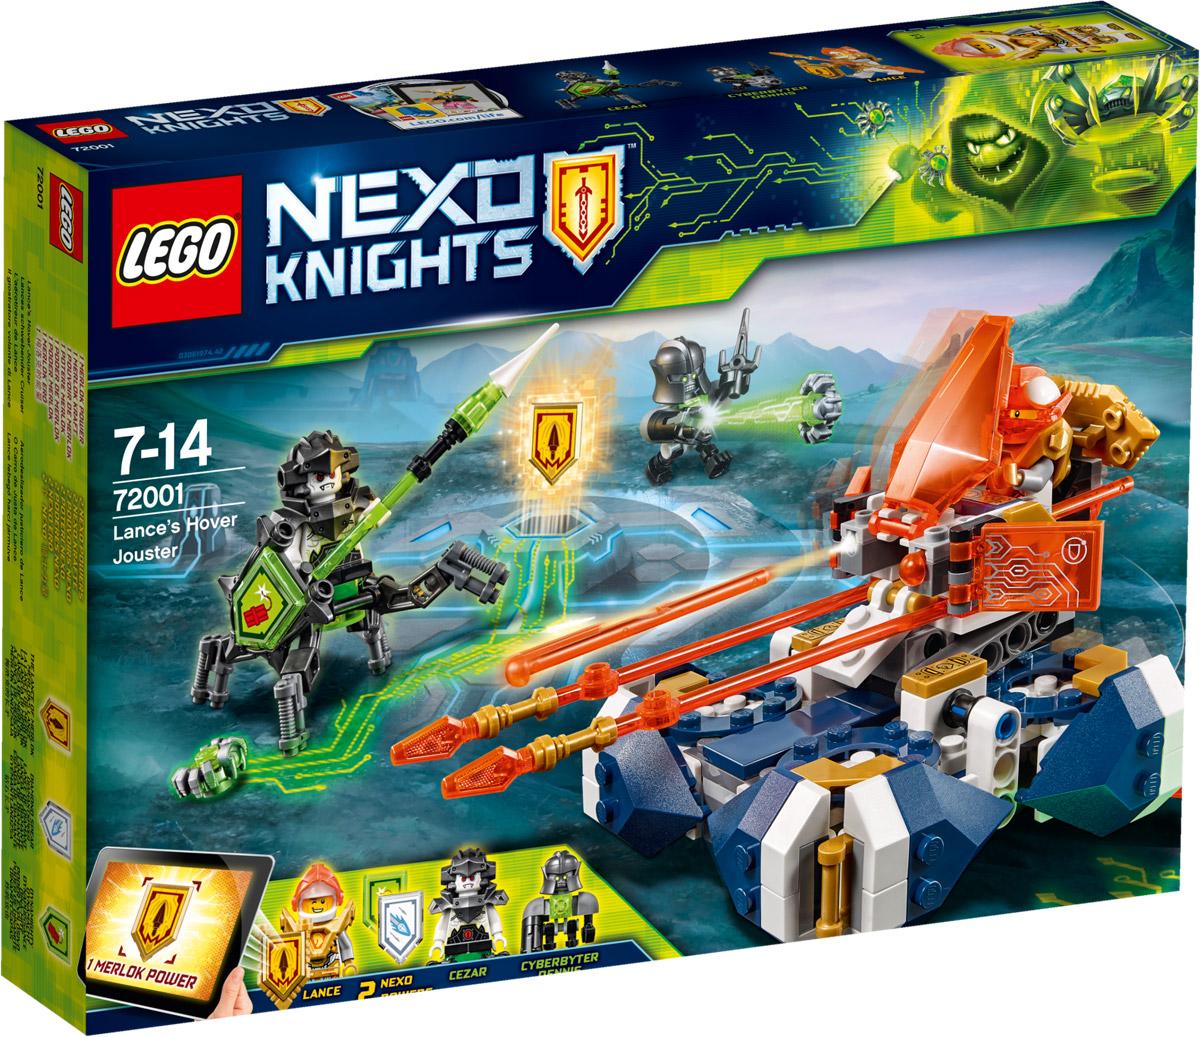 LEGO NEXO KNIGHTS Конструктор Летающая турнирная машина Ланса 72001 тетради lego тетрадь 100 листов линейка lego nexo knights рыцари нексо размер 19х24 7 см